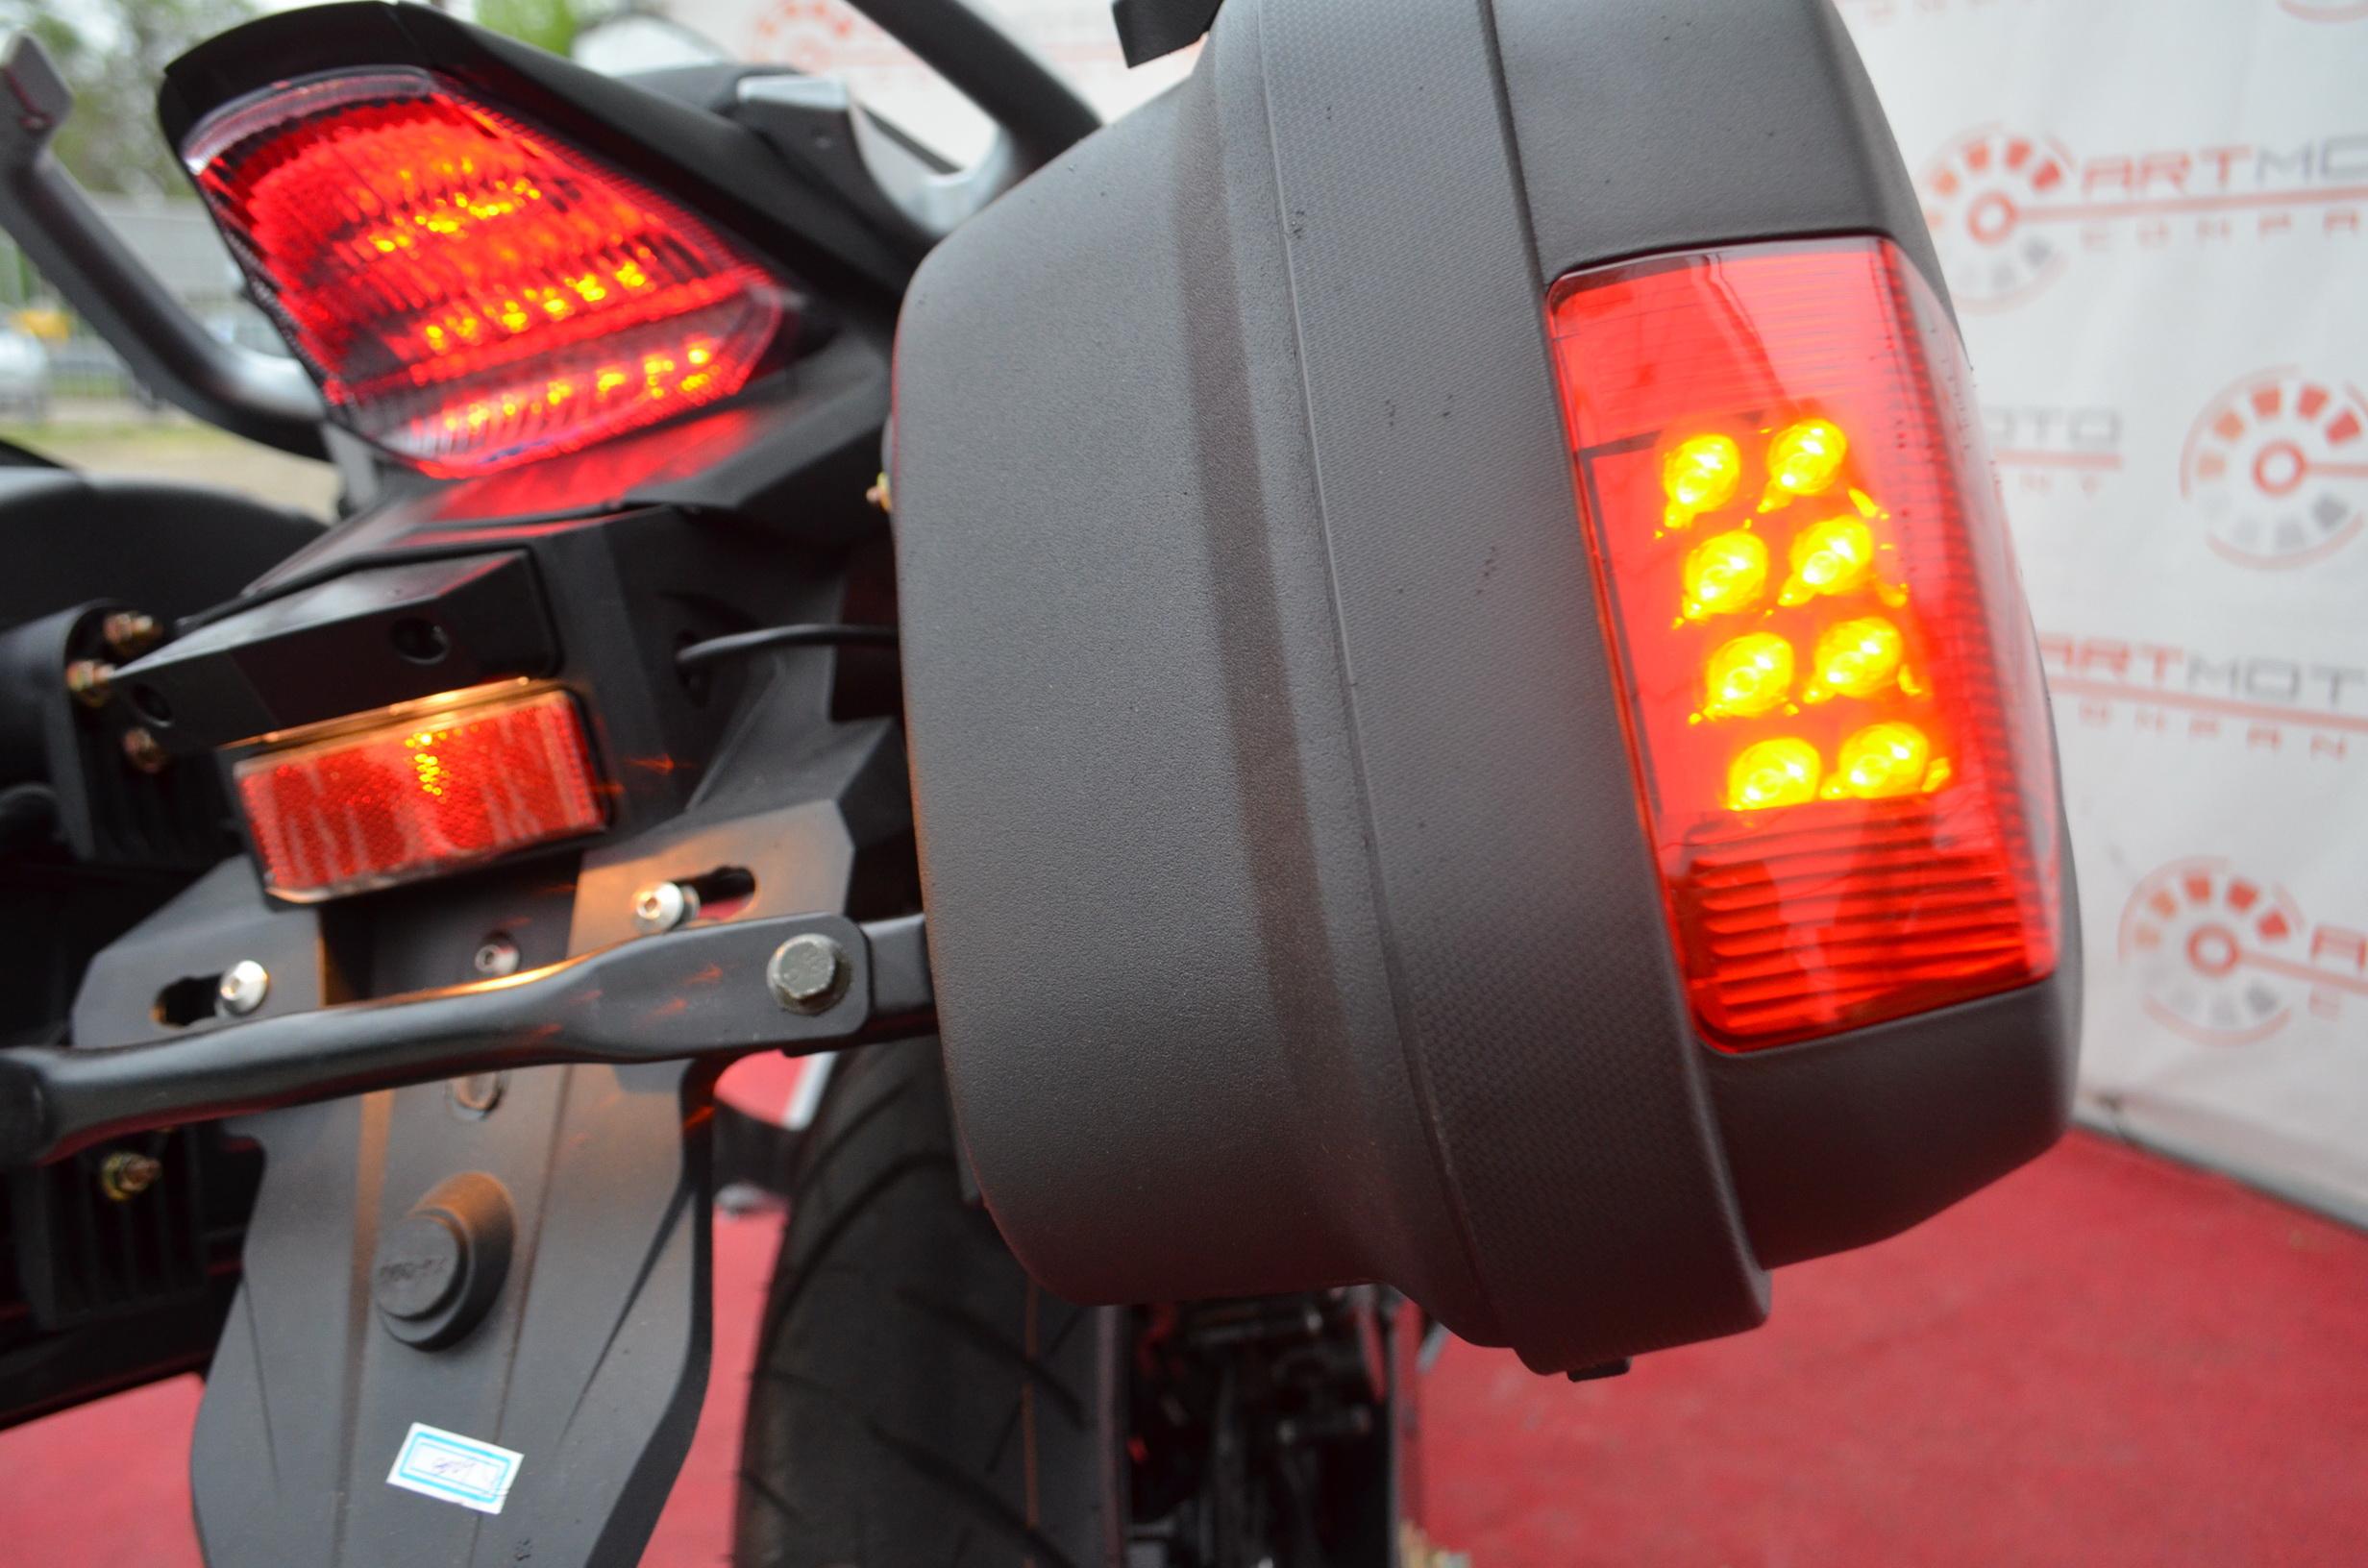 МОТОЦИКЛ BASHAN PSB 250 Black ― Артмото - купить квадроцикл в украине и харькове, мотоцикл, снегоход, скутер, мопед, электромобиль